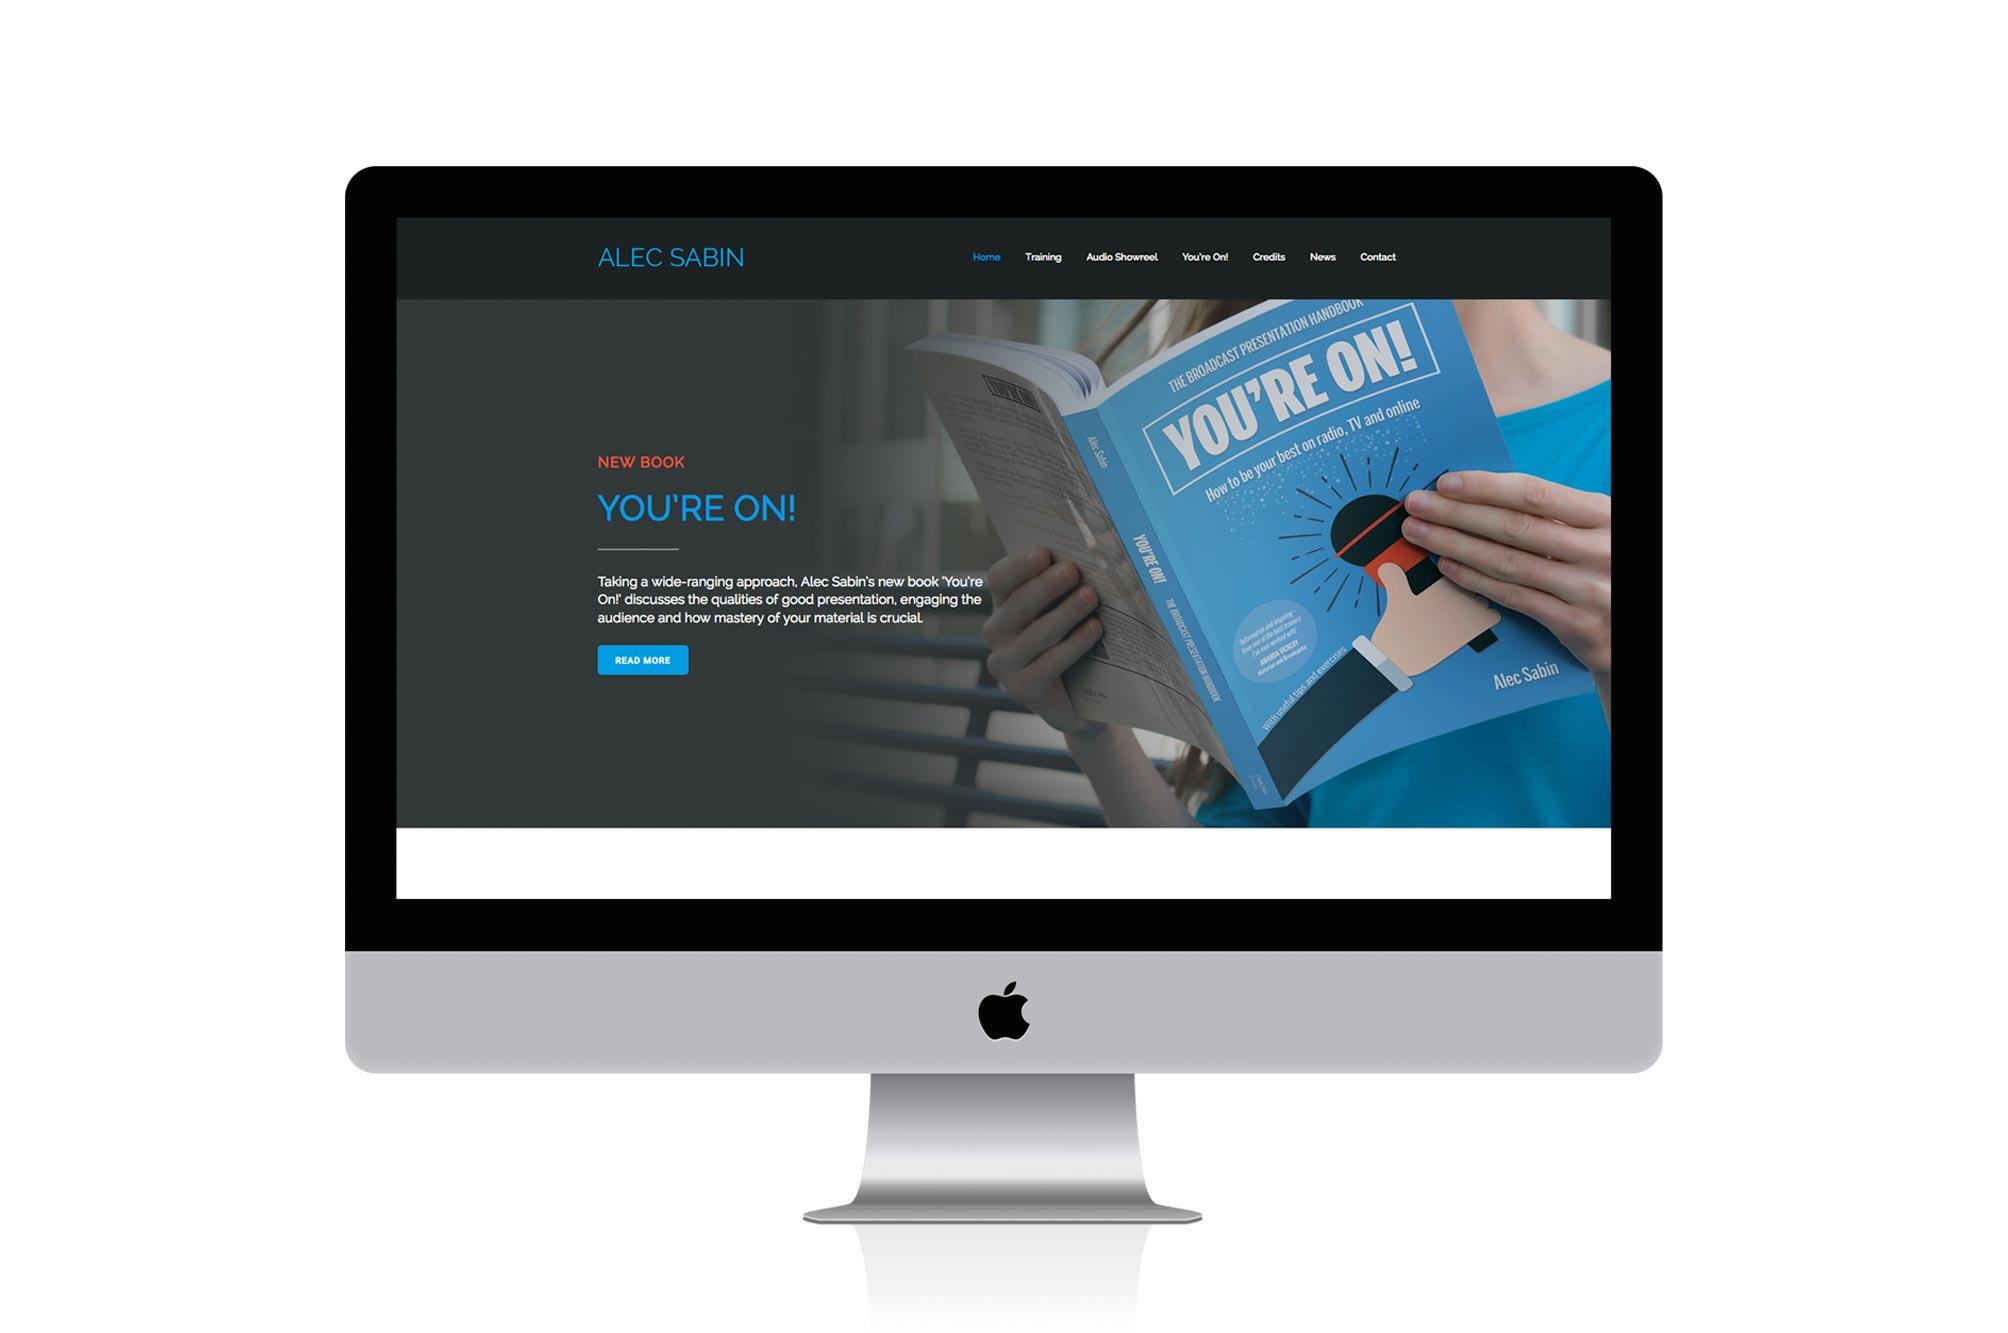 Alec Sabin Website Home Page on an iMac